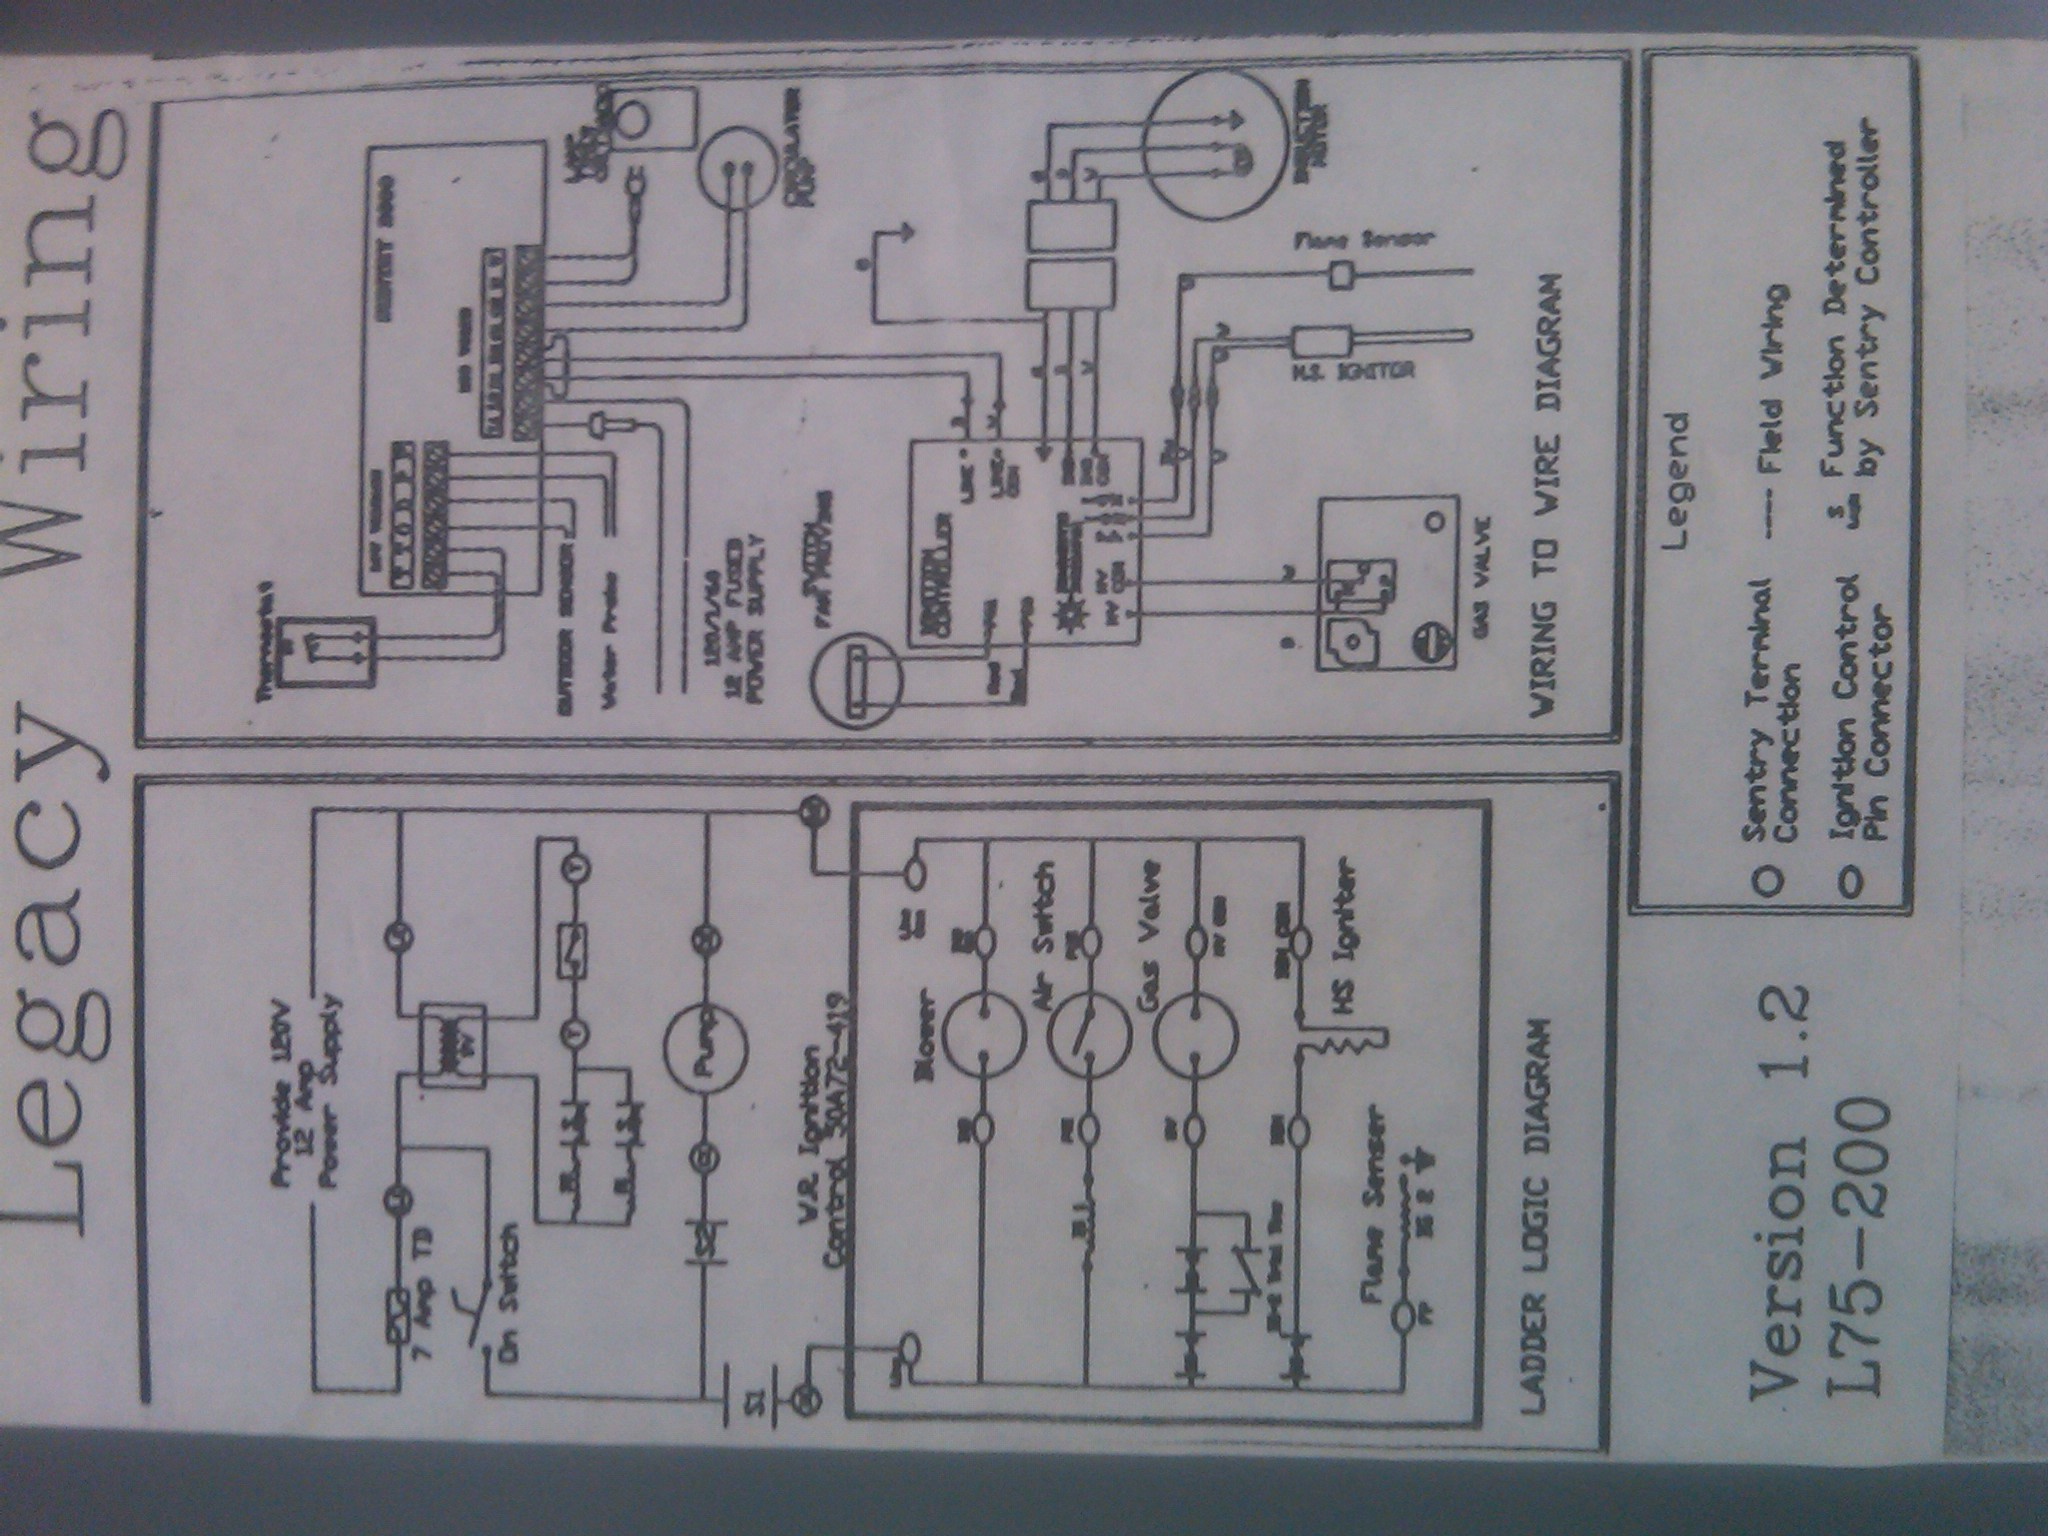 firebird boiler thermostat wiring diagram 2003 ford escape fuse panel oil